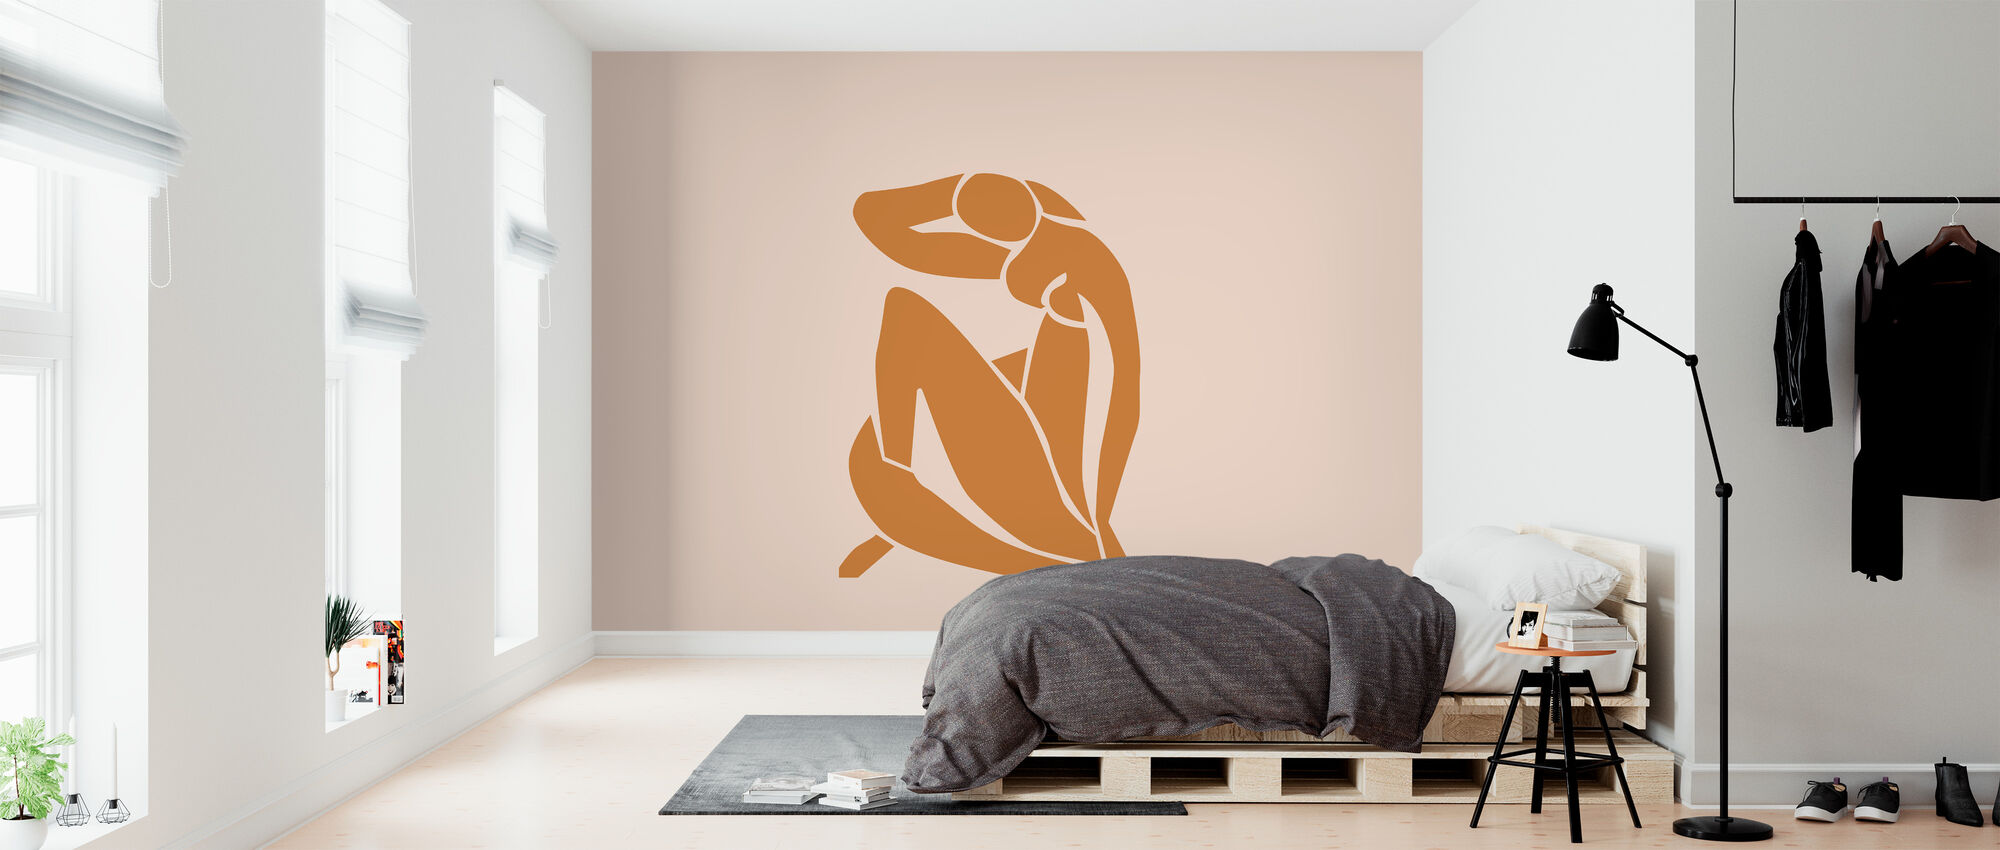 Lady Knelt - Wallpaper - Bedroom